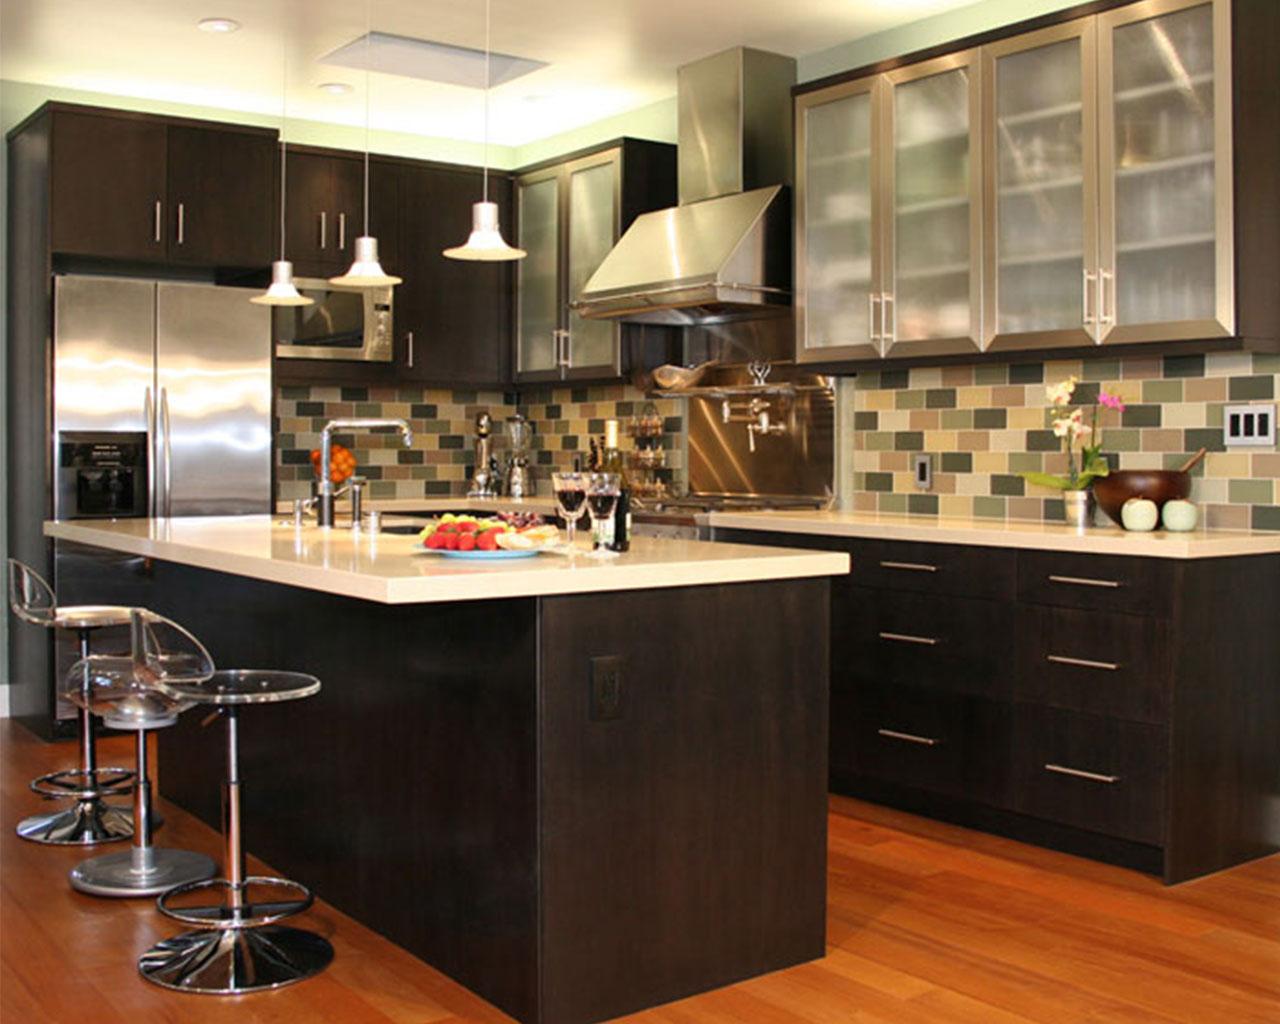 ديكورات مطابخ رقيقة الوان هادئة The-Kitchen-Design-M